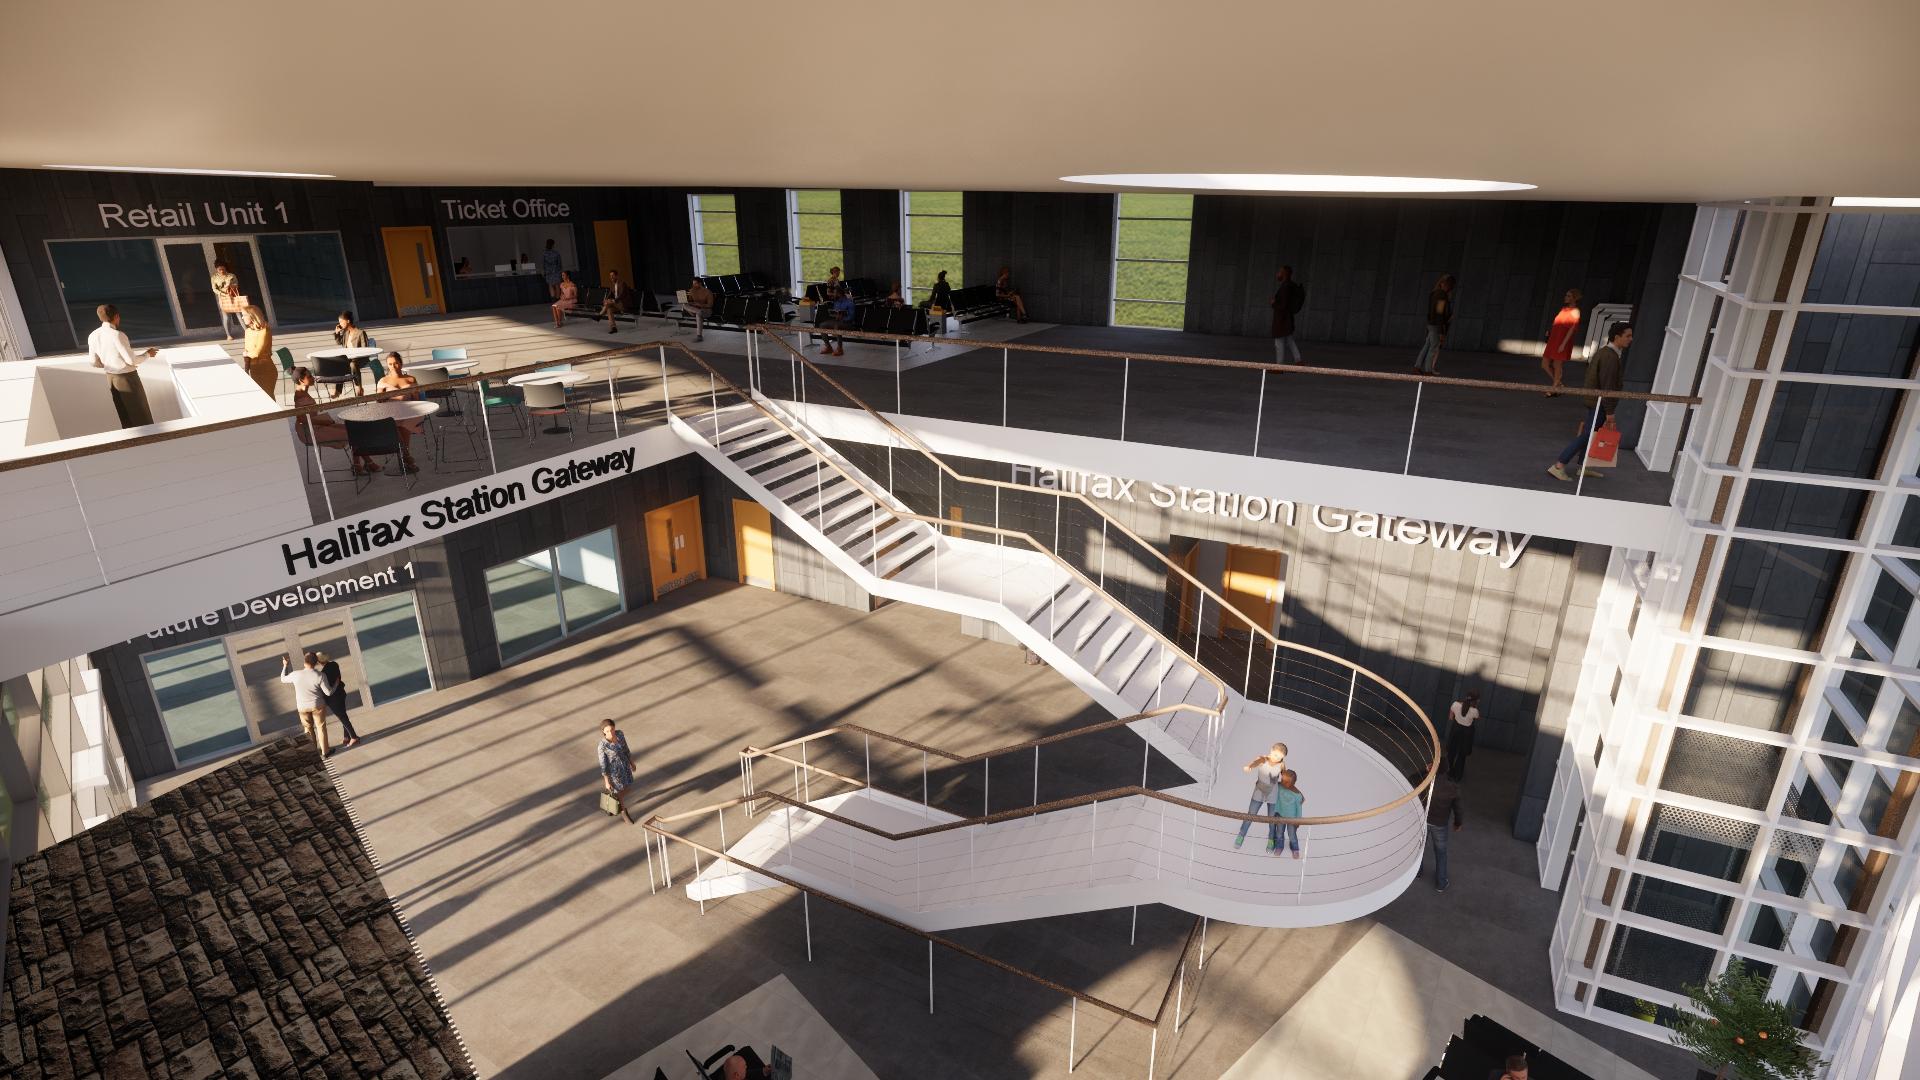 Halifax Railway Station building proposal